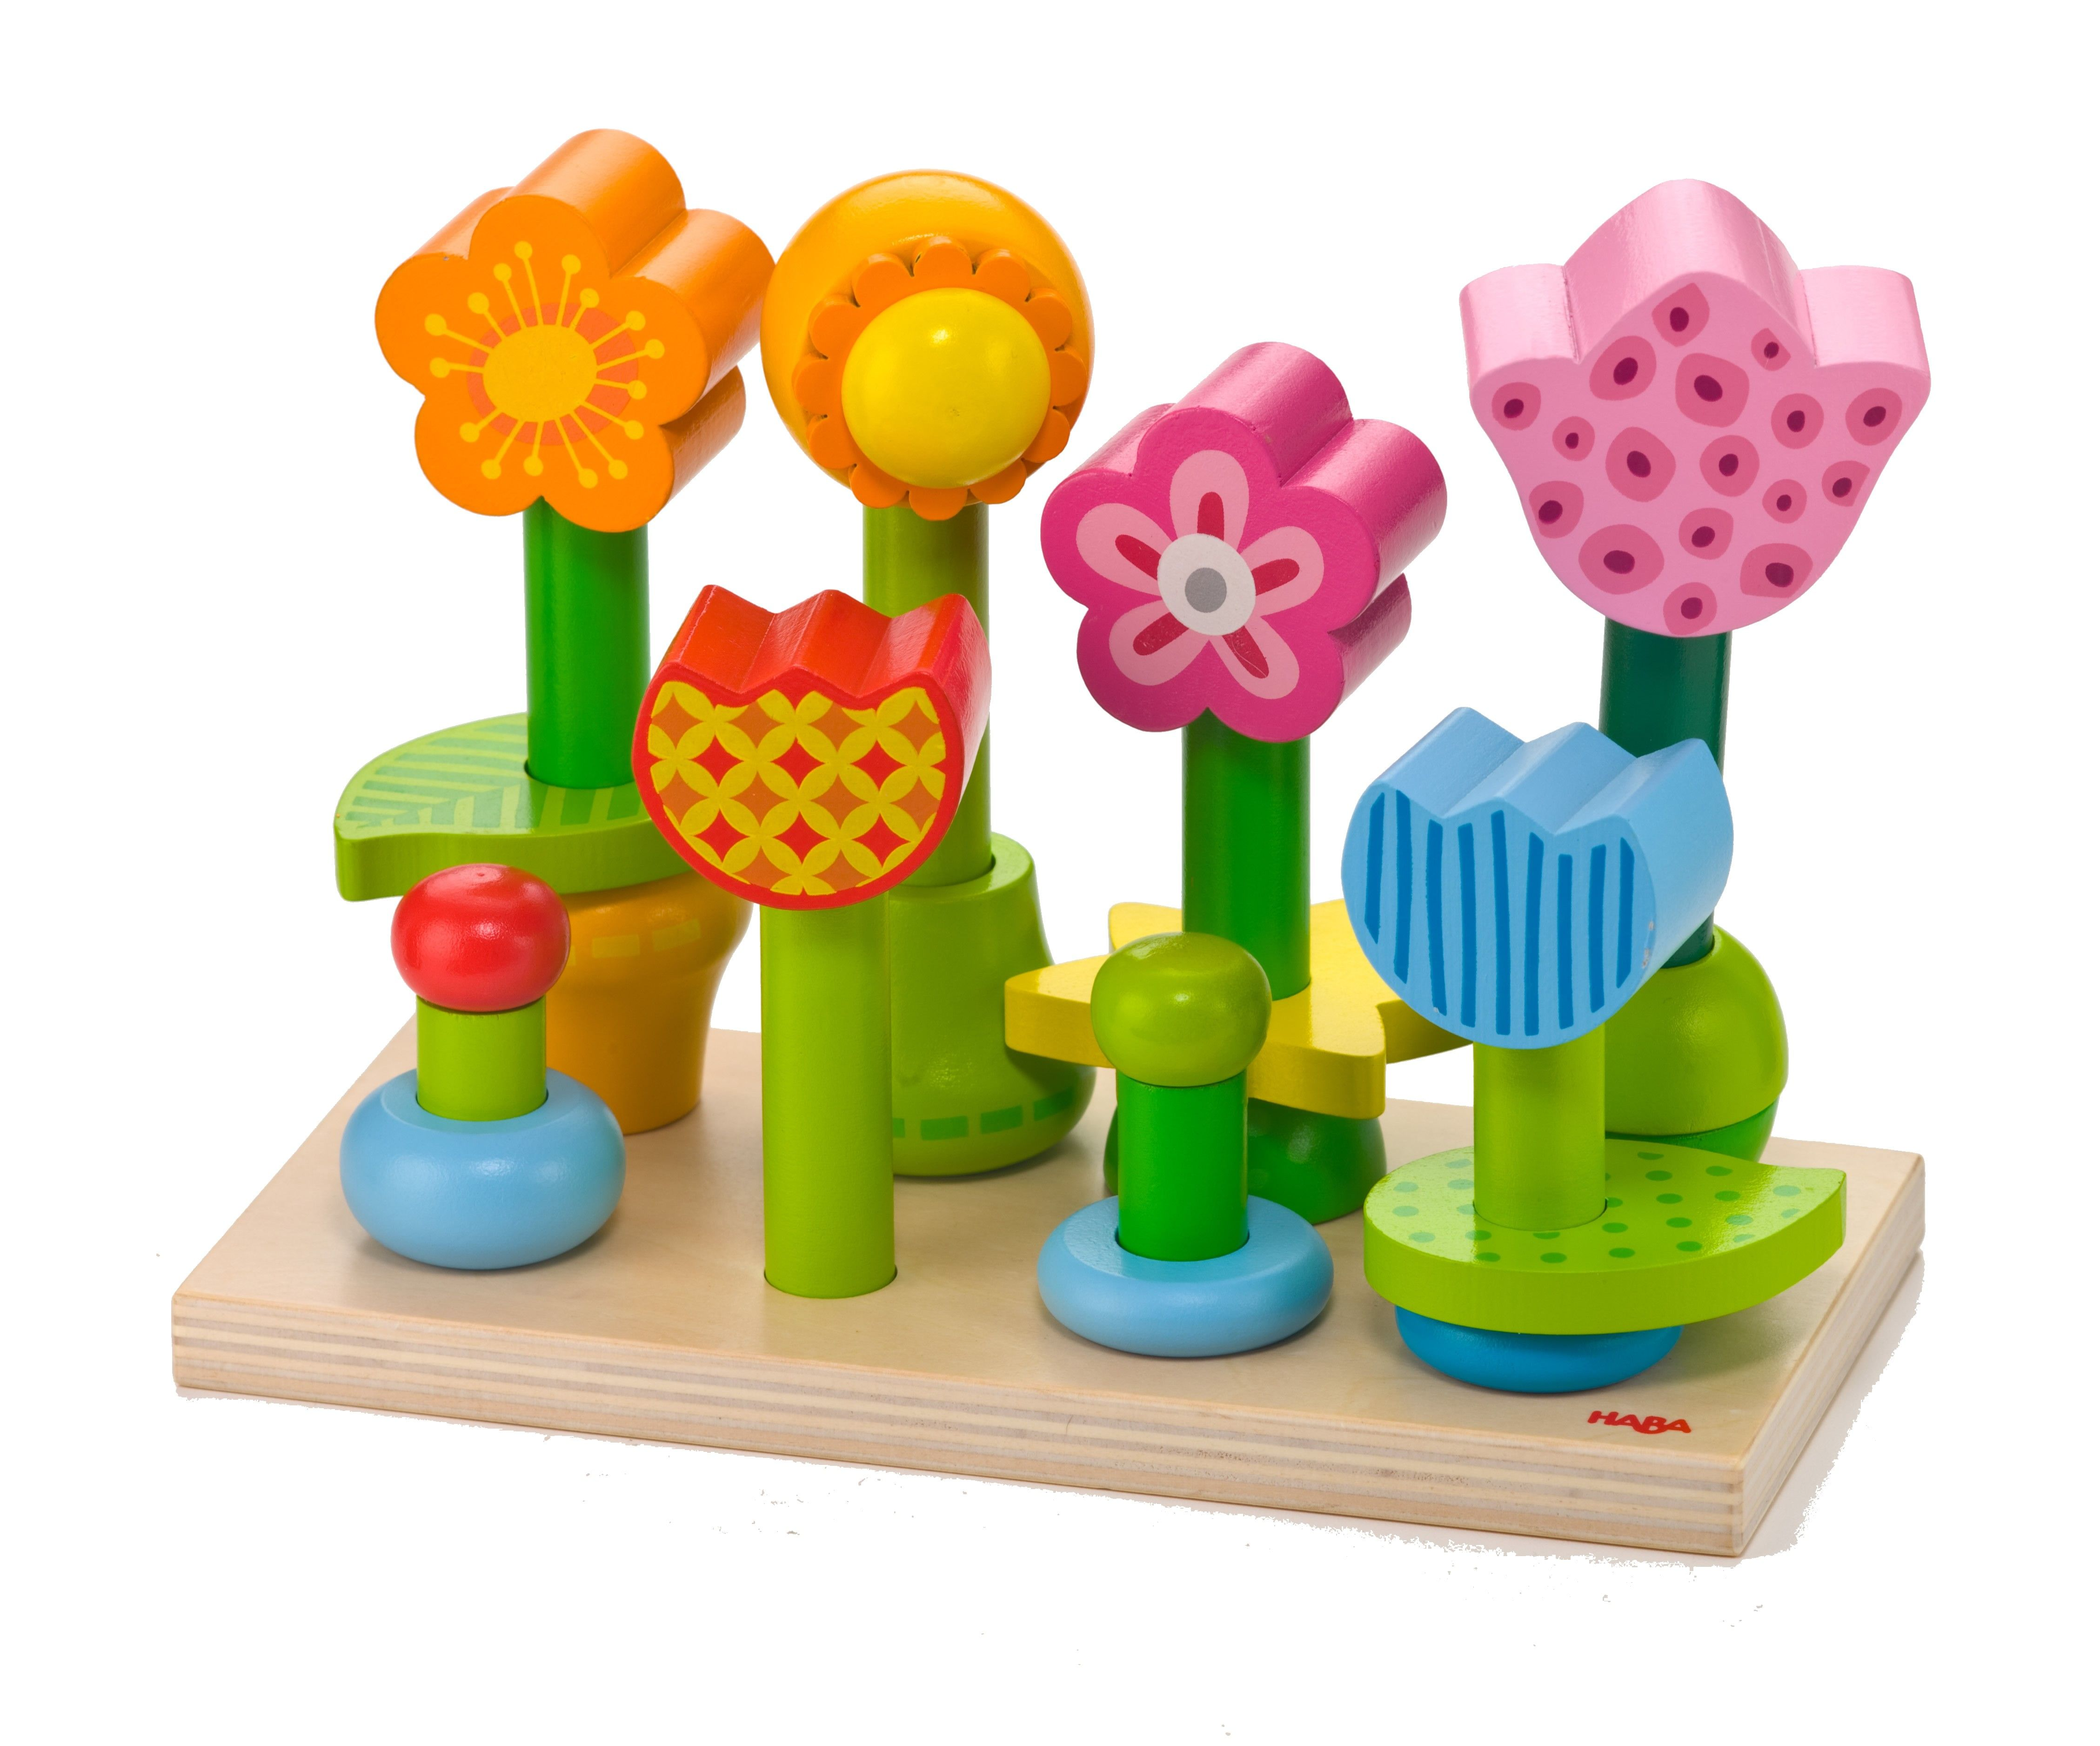 Bonita Garden   Wooden Pegging Set | HABA USA